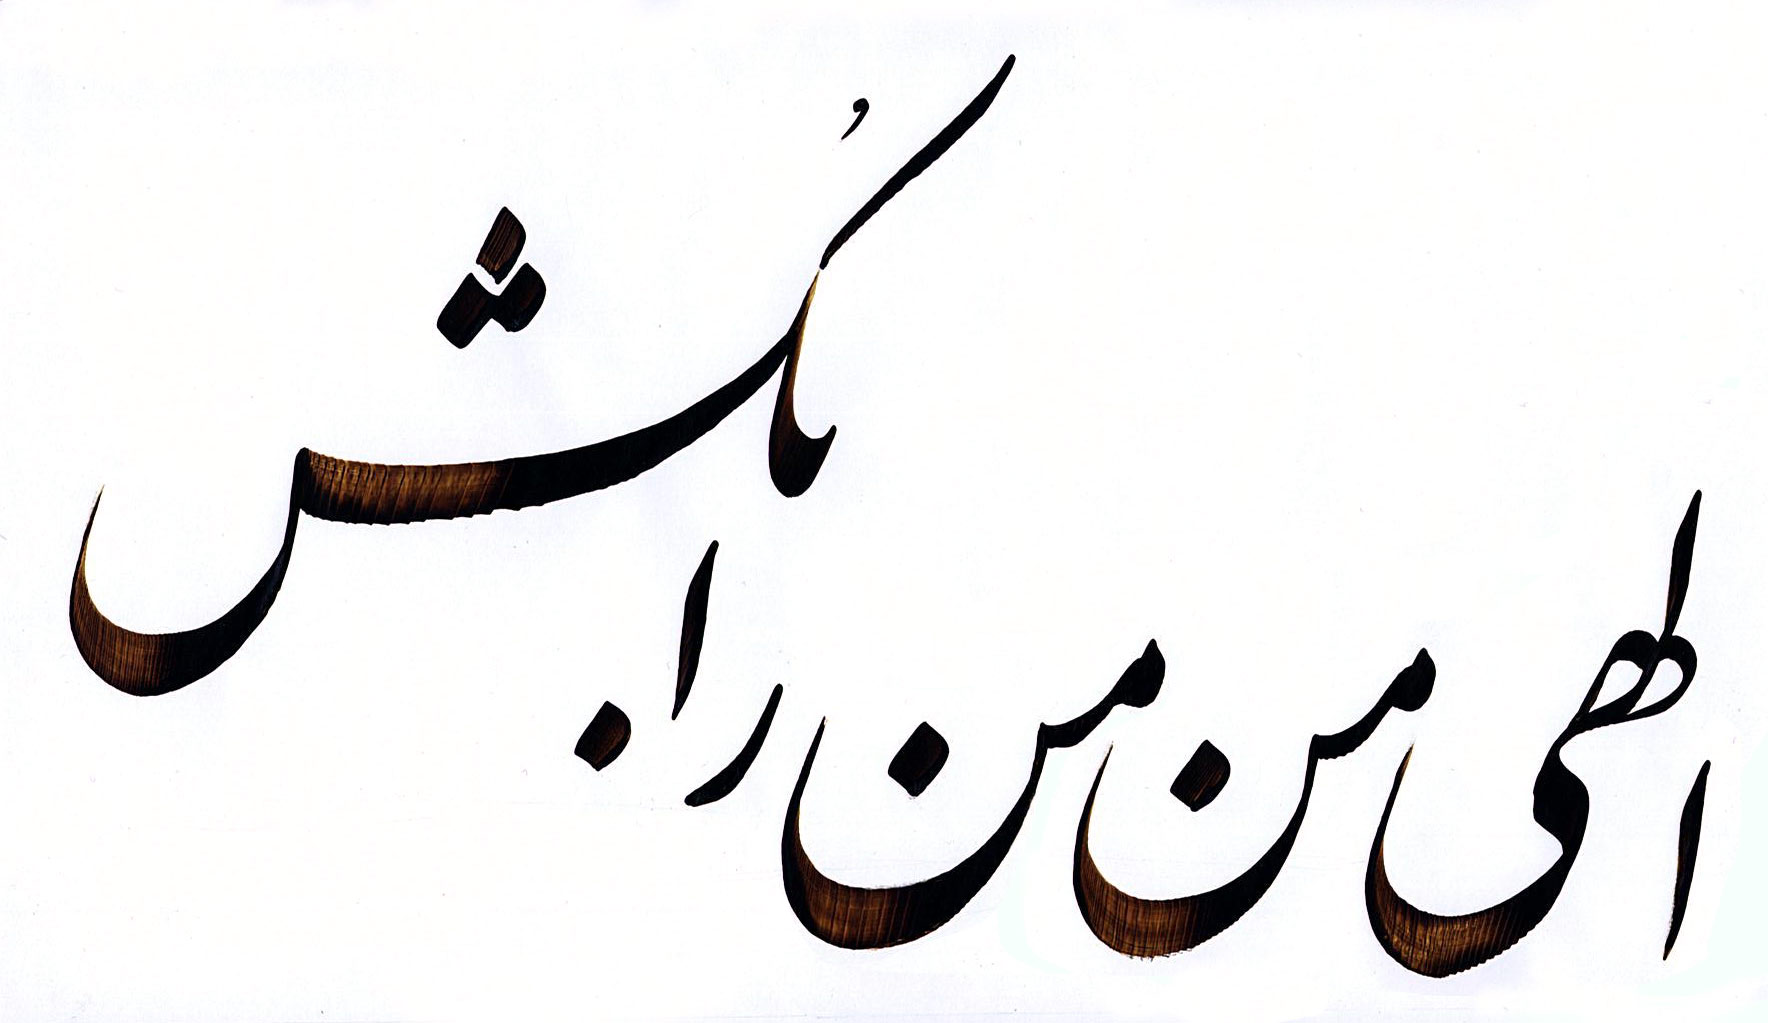 http://aftabgardan.persiangig.com/img/hamid/man_e_man_ra_bekosh.jpg